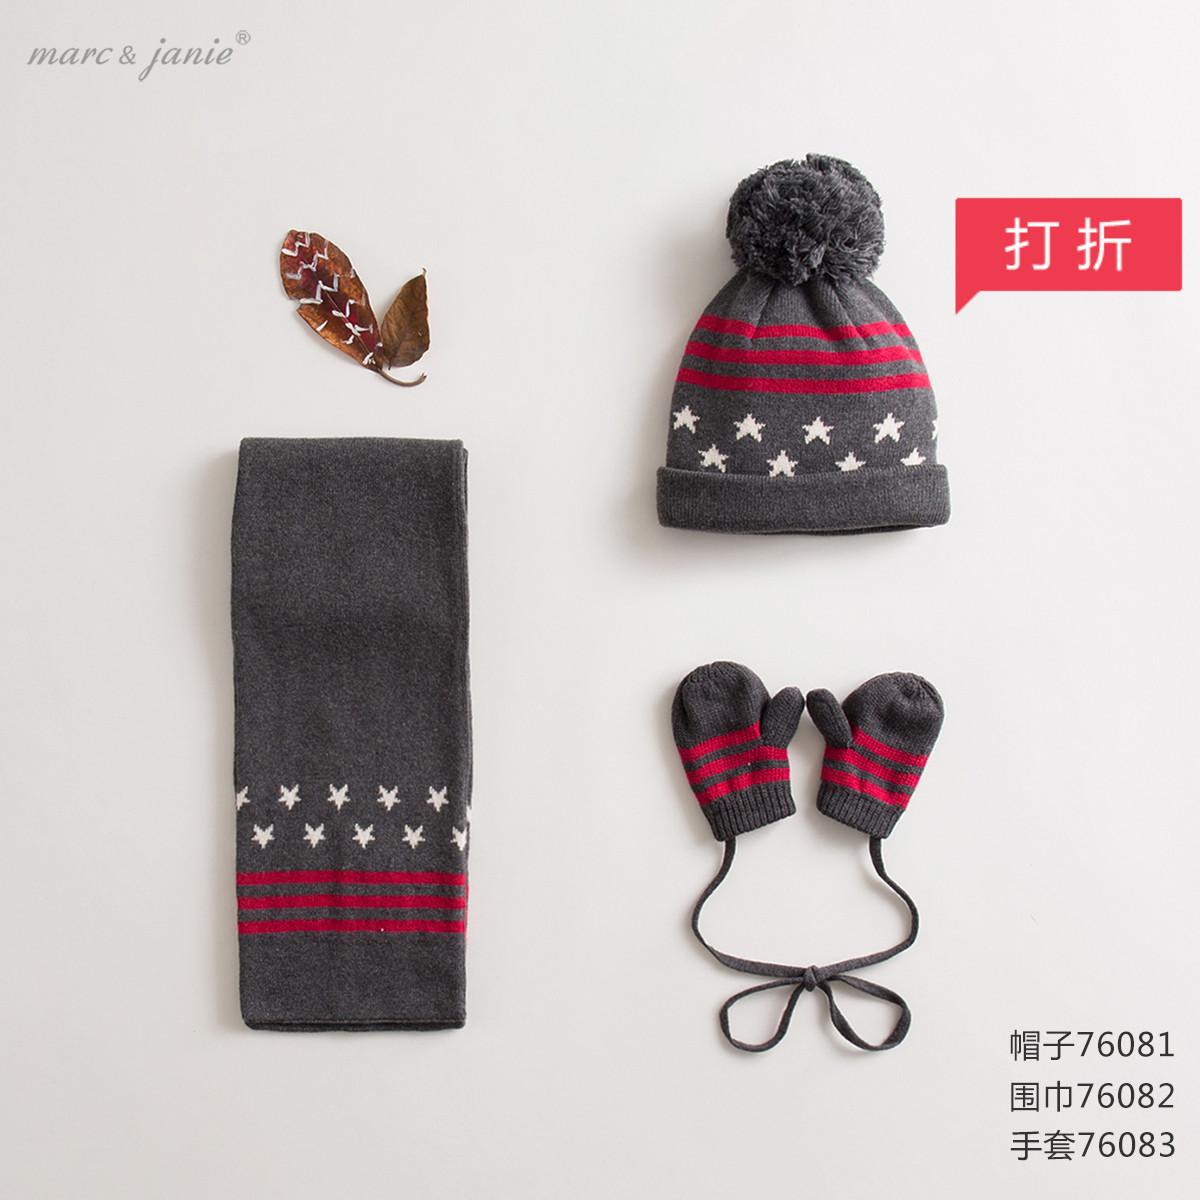 Перчатки детские Marc & janie tp76083 76083